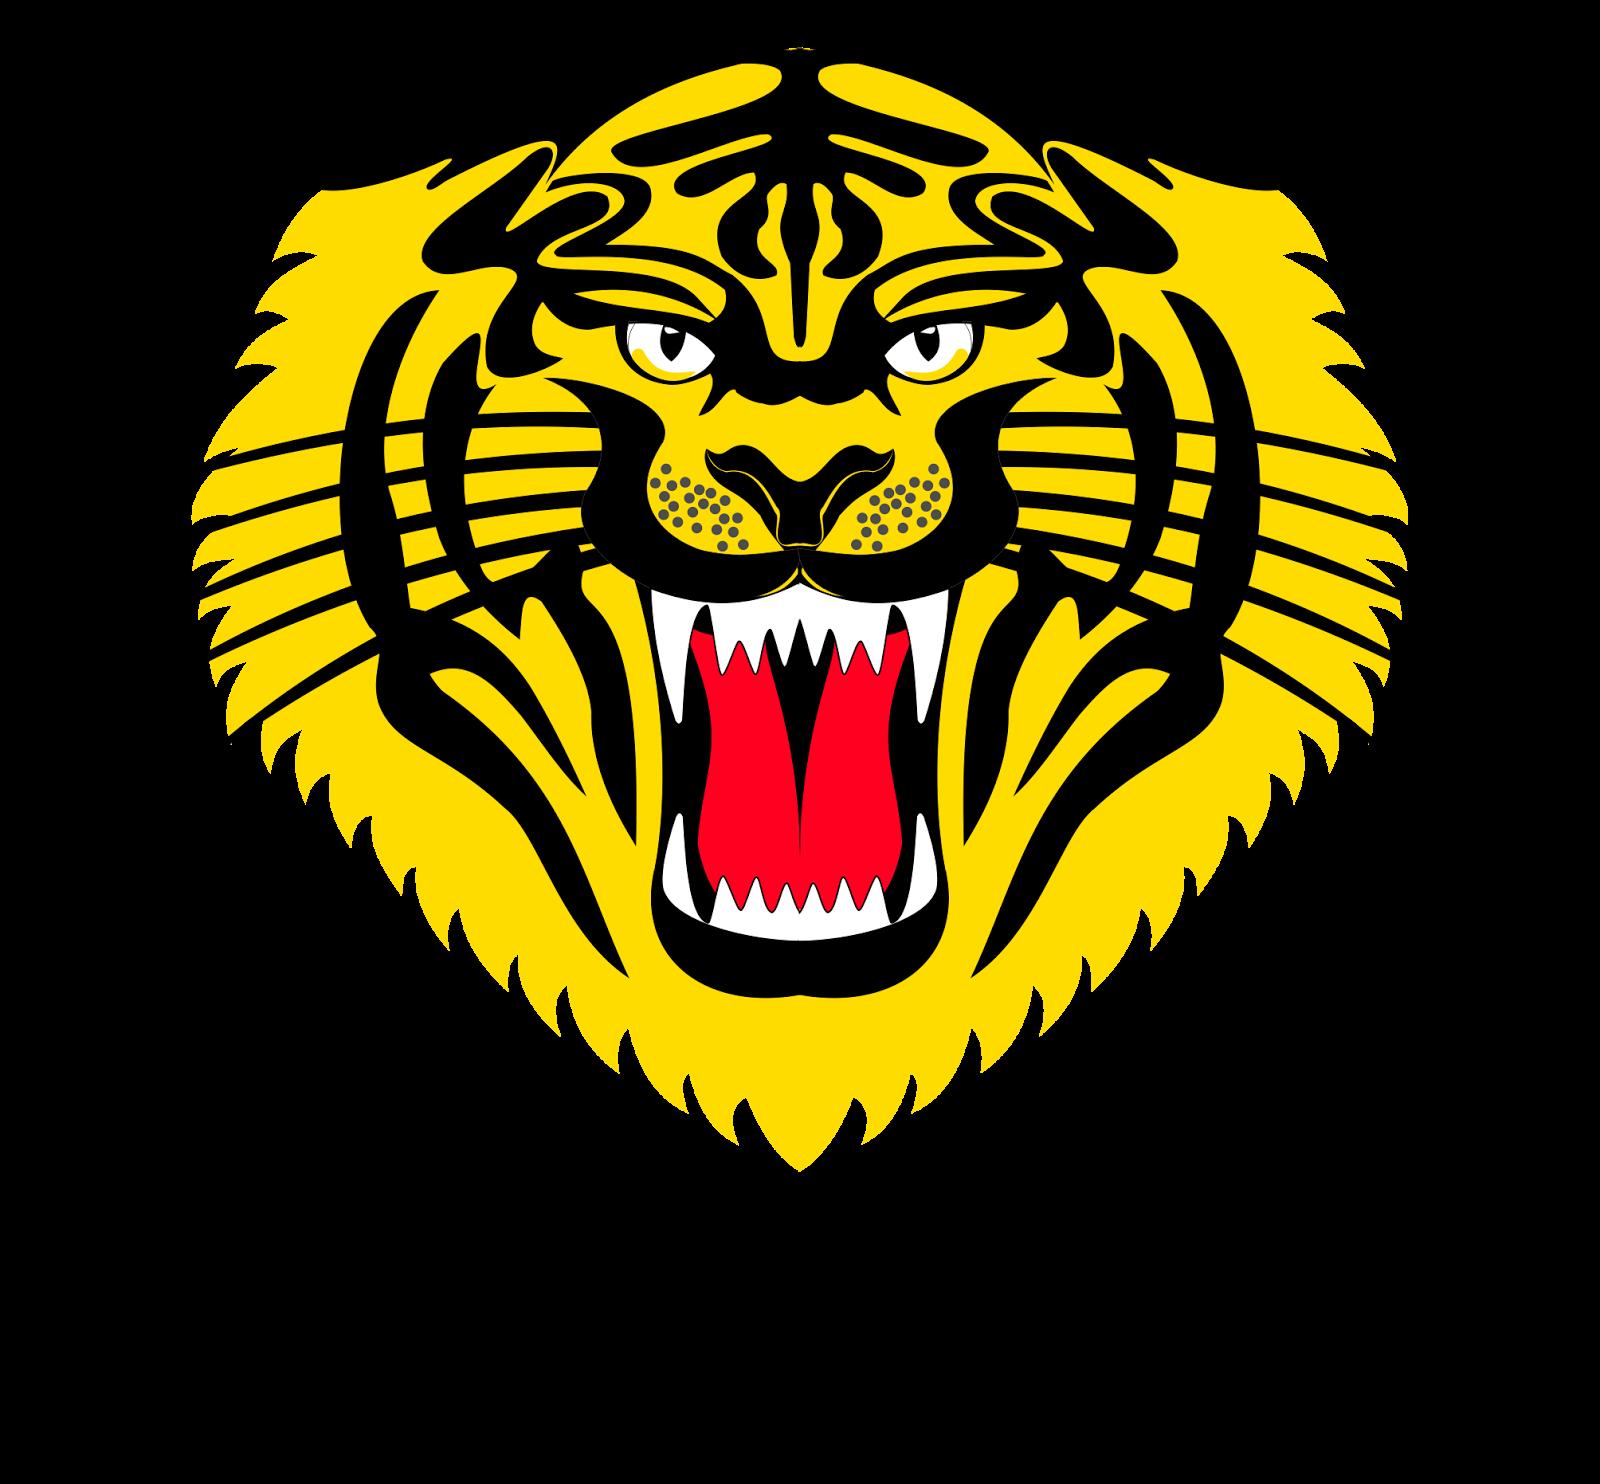 tiger head logo - HD1600×1484